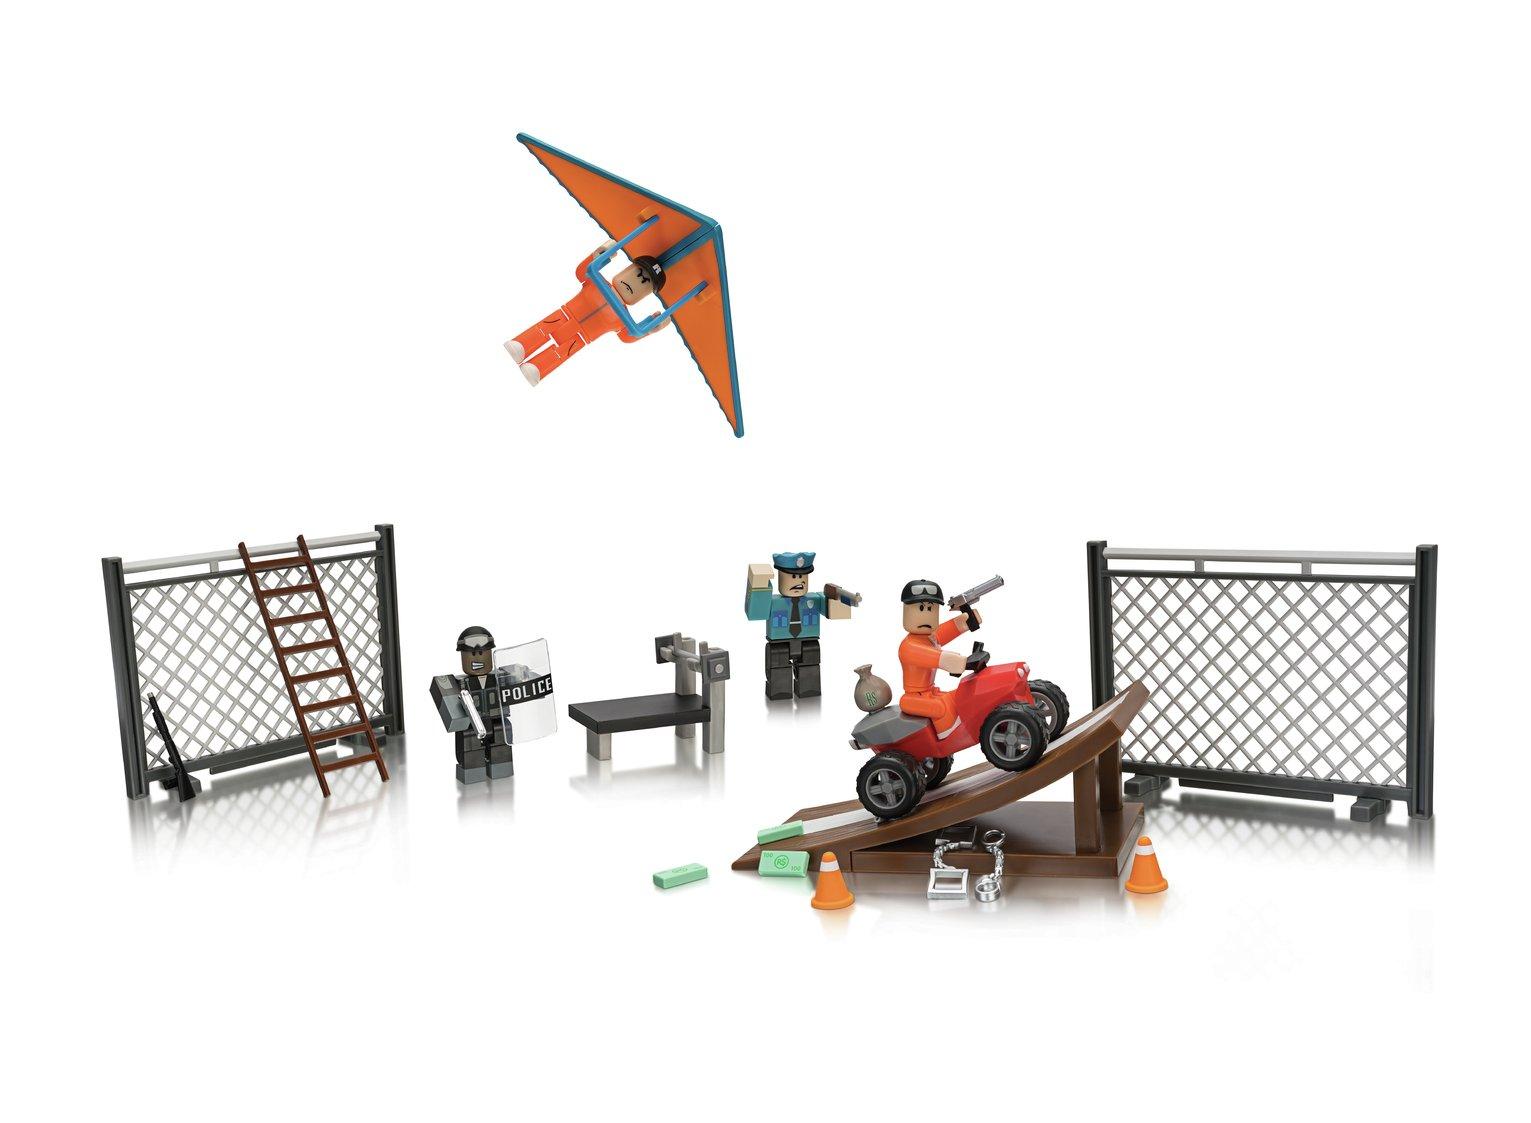 Roblox Jailbreak - Great Escape Playset